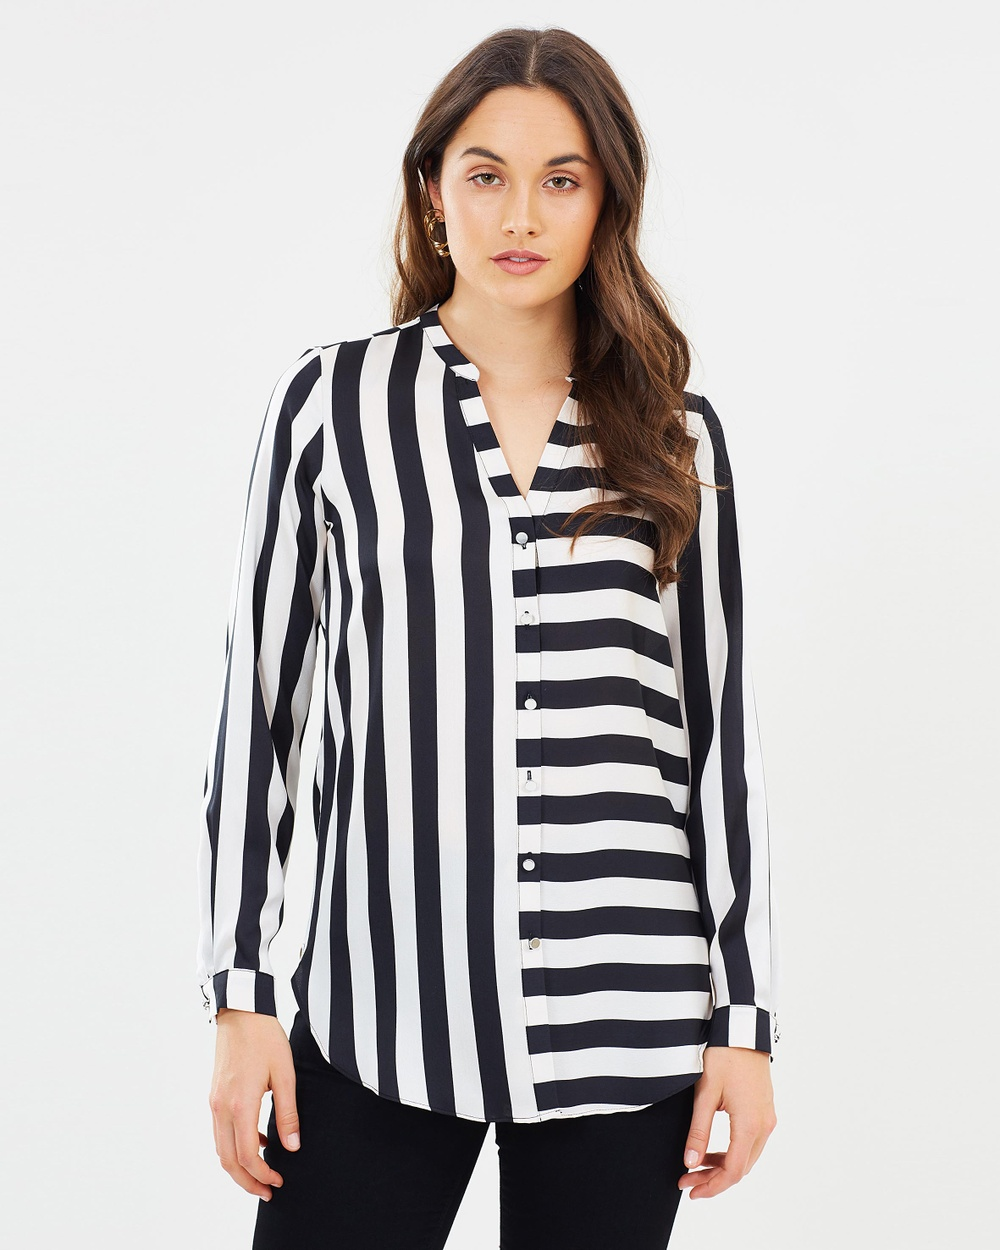 Wallis Humbug Shirt Tops Black & White Humbug Shirt